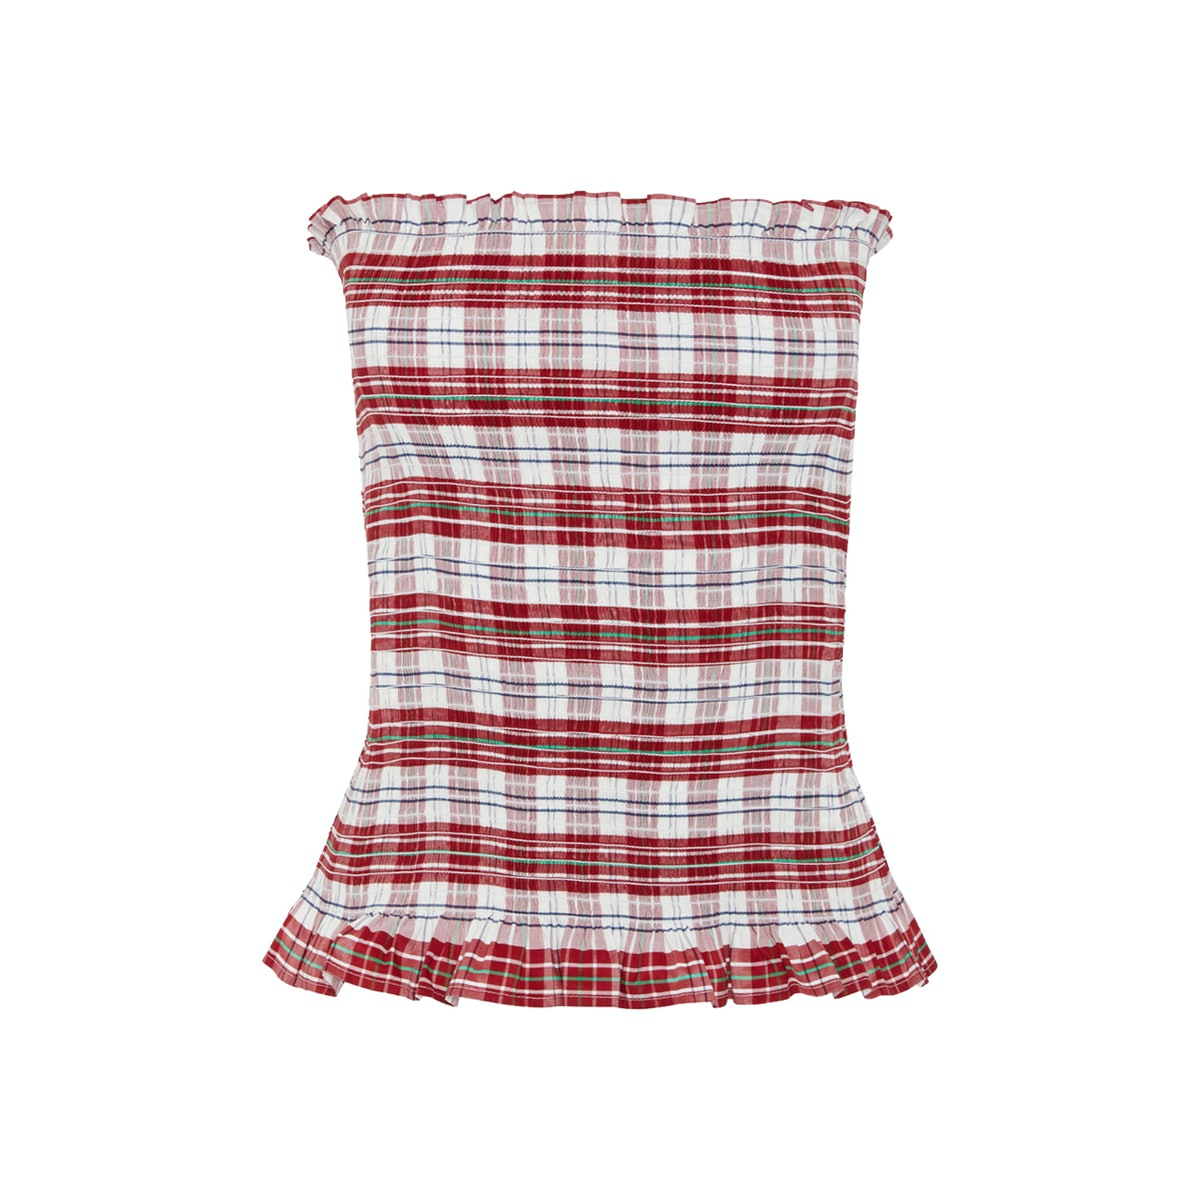 Molly Goddard Kim Strapless Ruffled Shirred Top